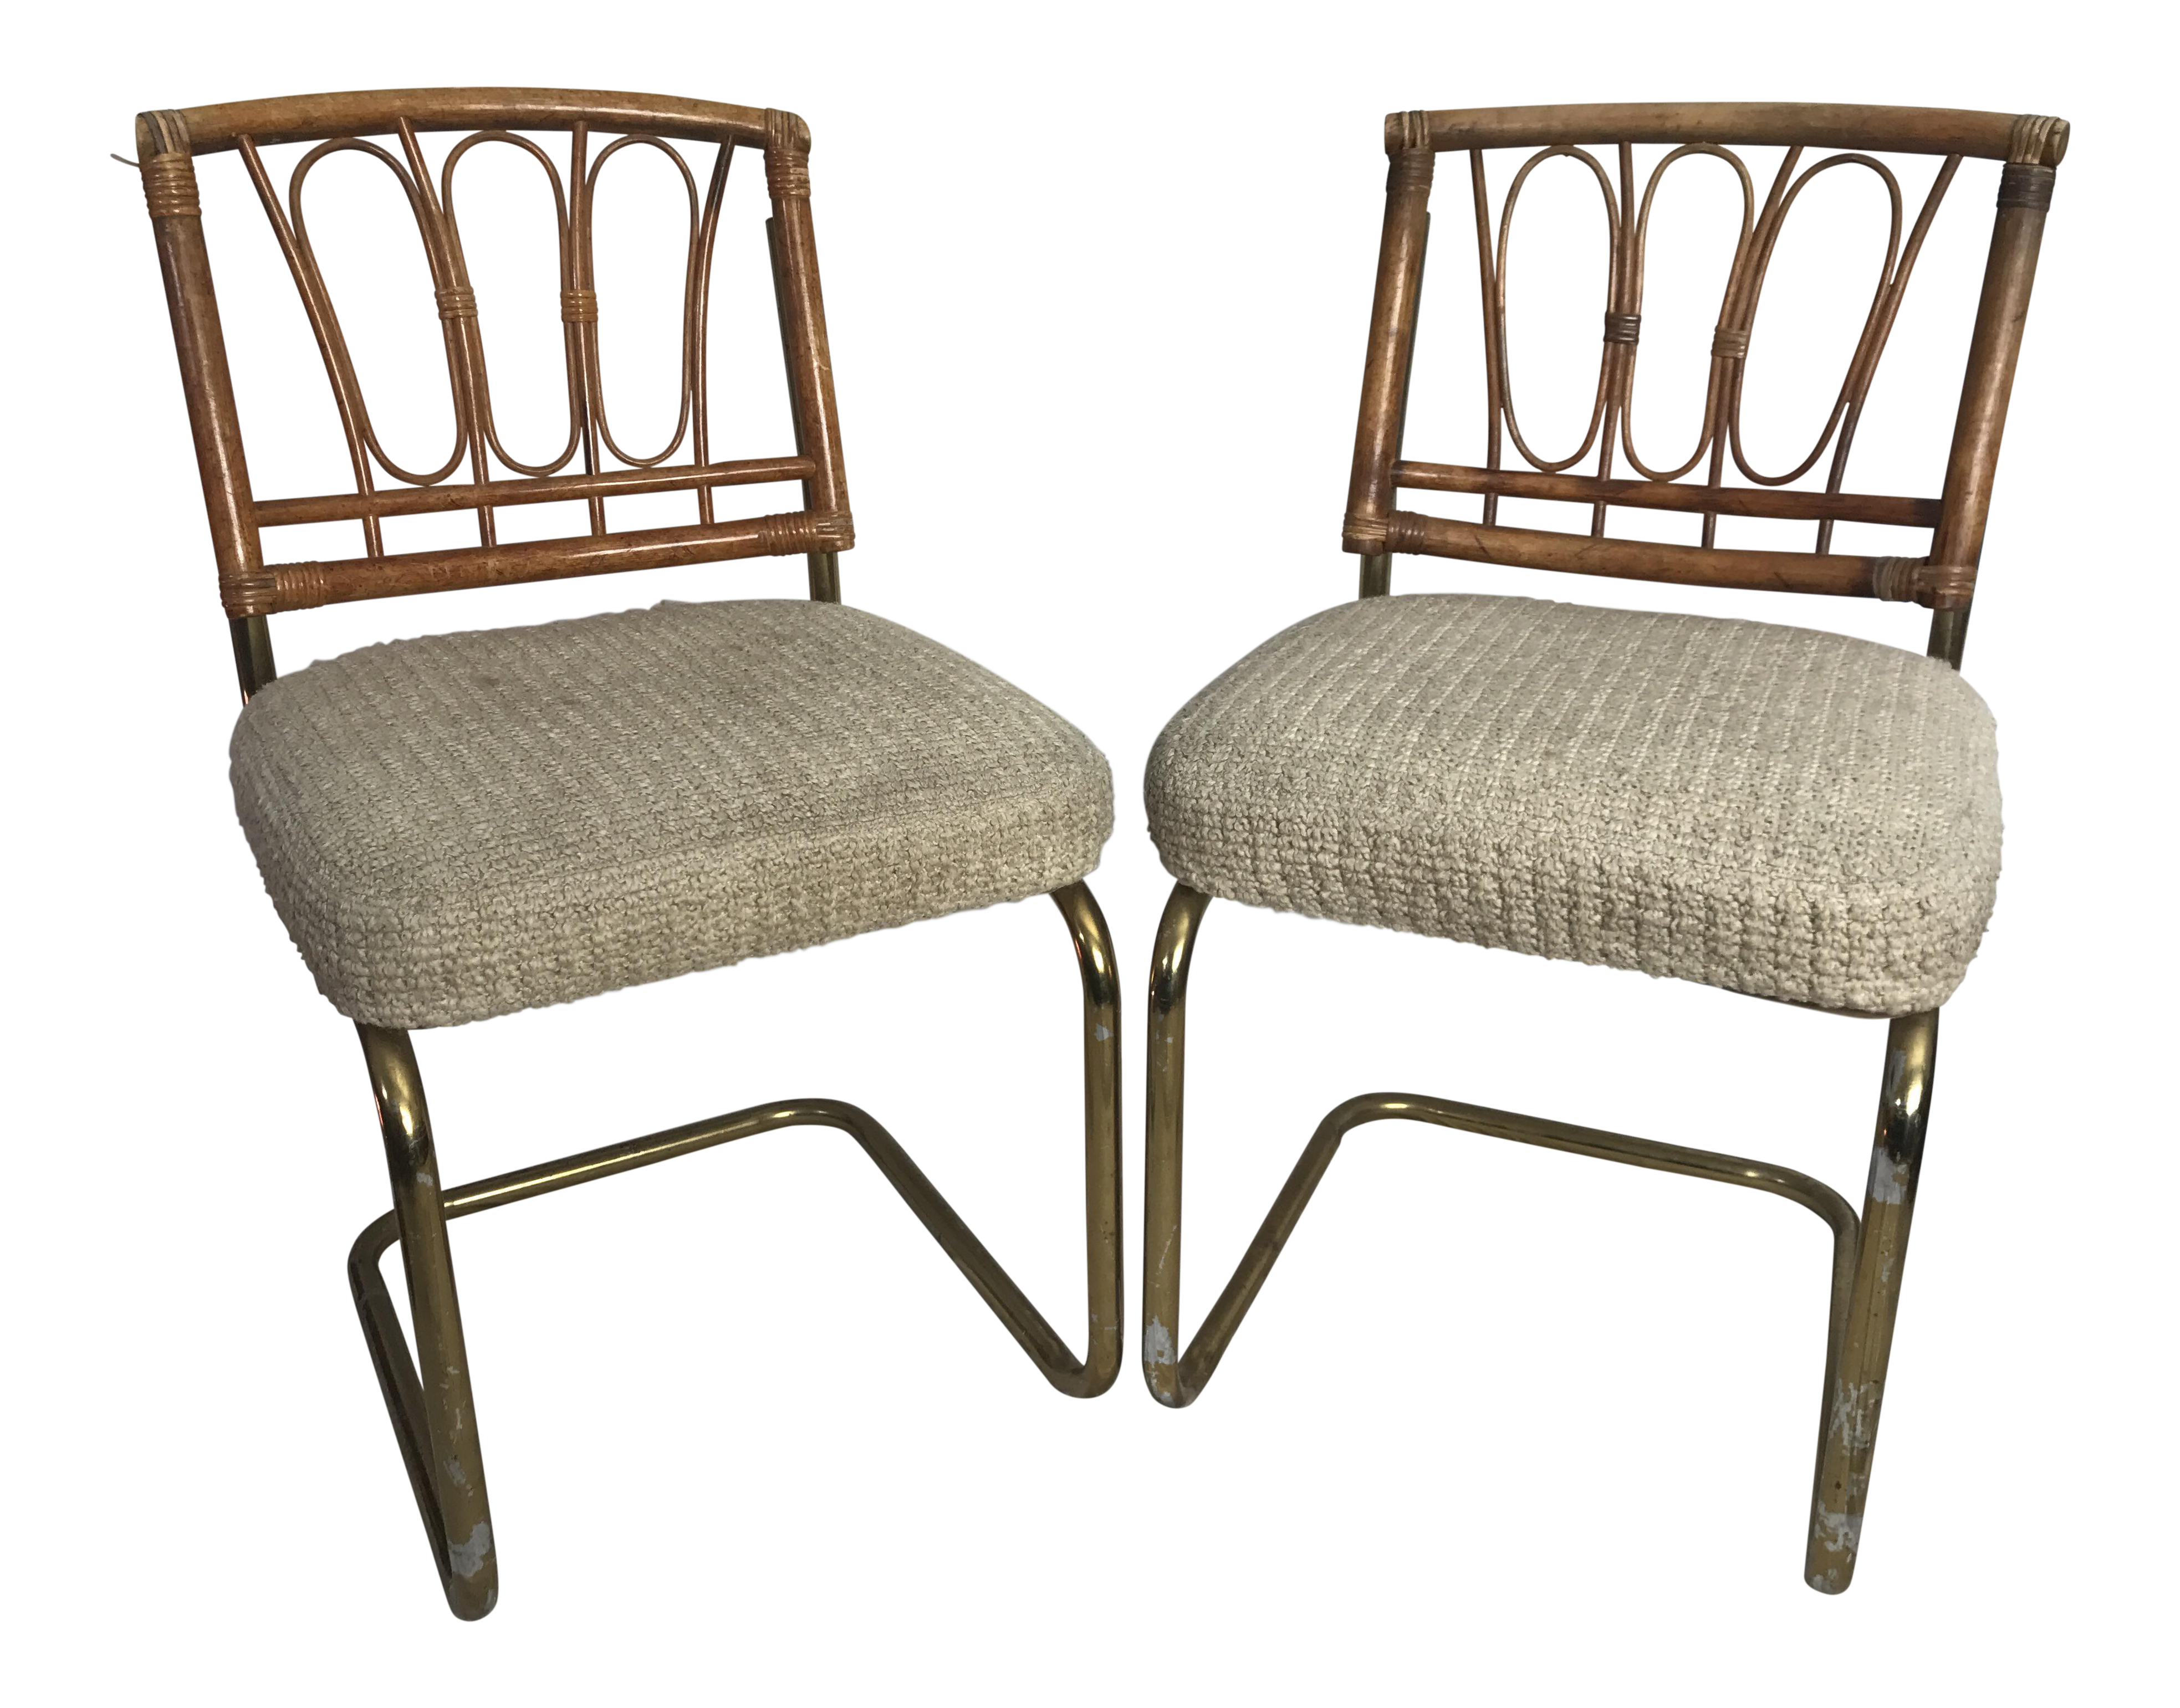 Douglas Furniture Chrome Cantilever Bamboo Chenille Seats